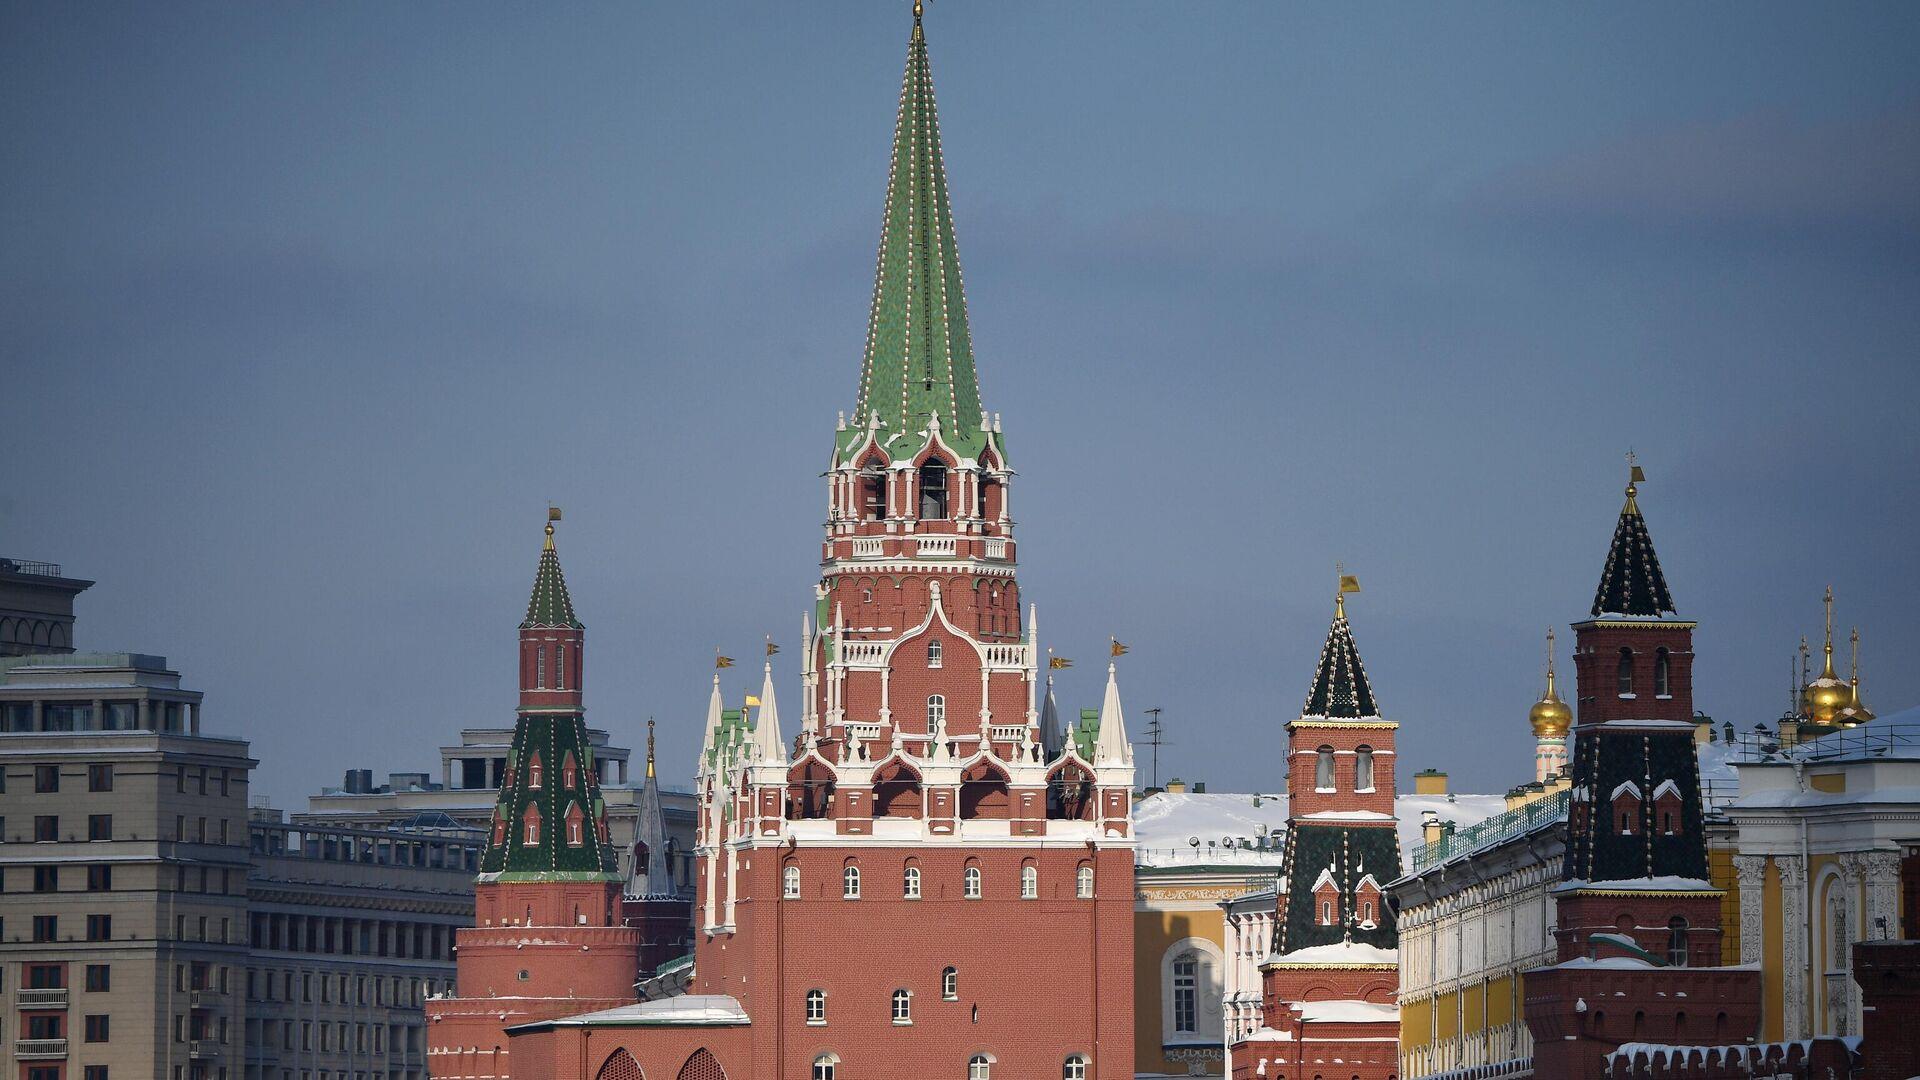 El Kremlin de Moscú, Rusia - Sputnik Mundo, 1920, 25.03.2021